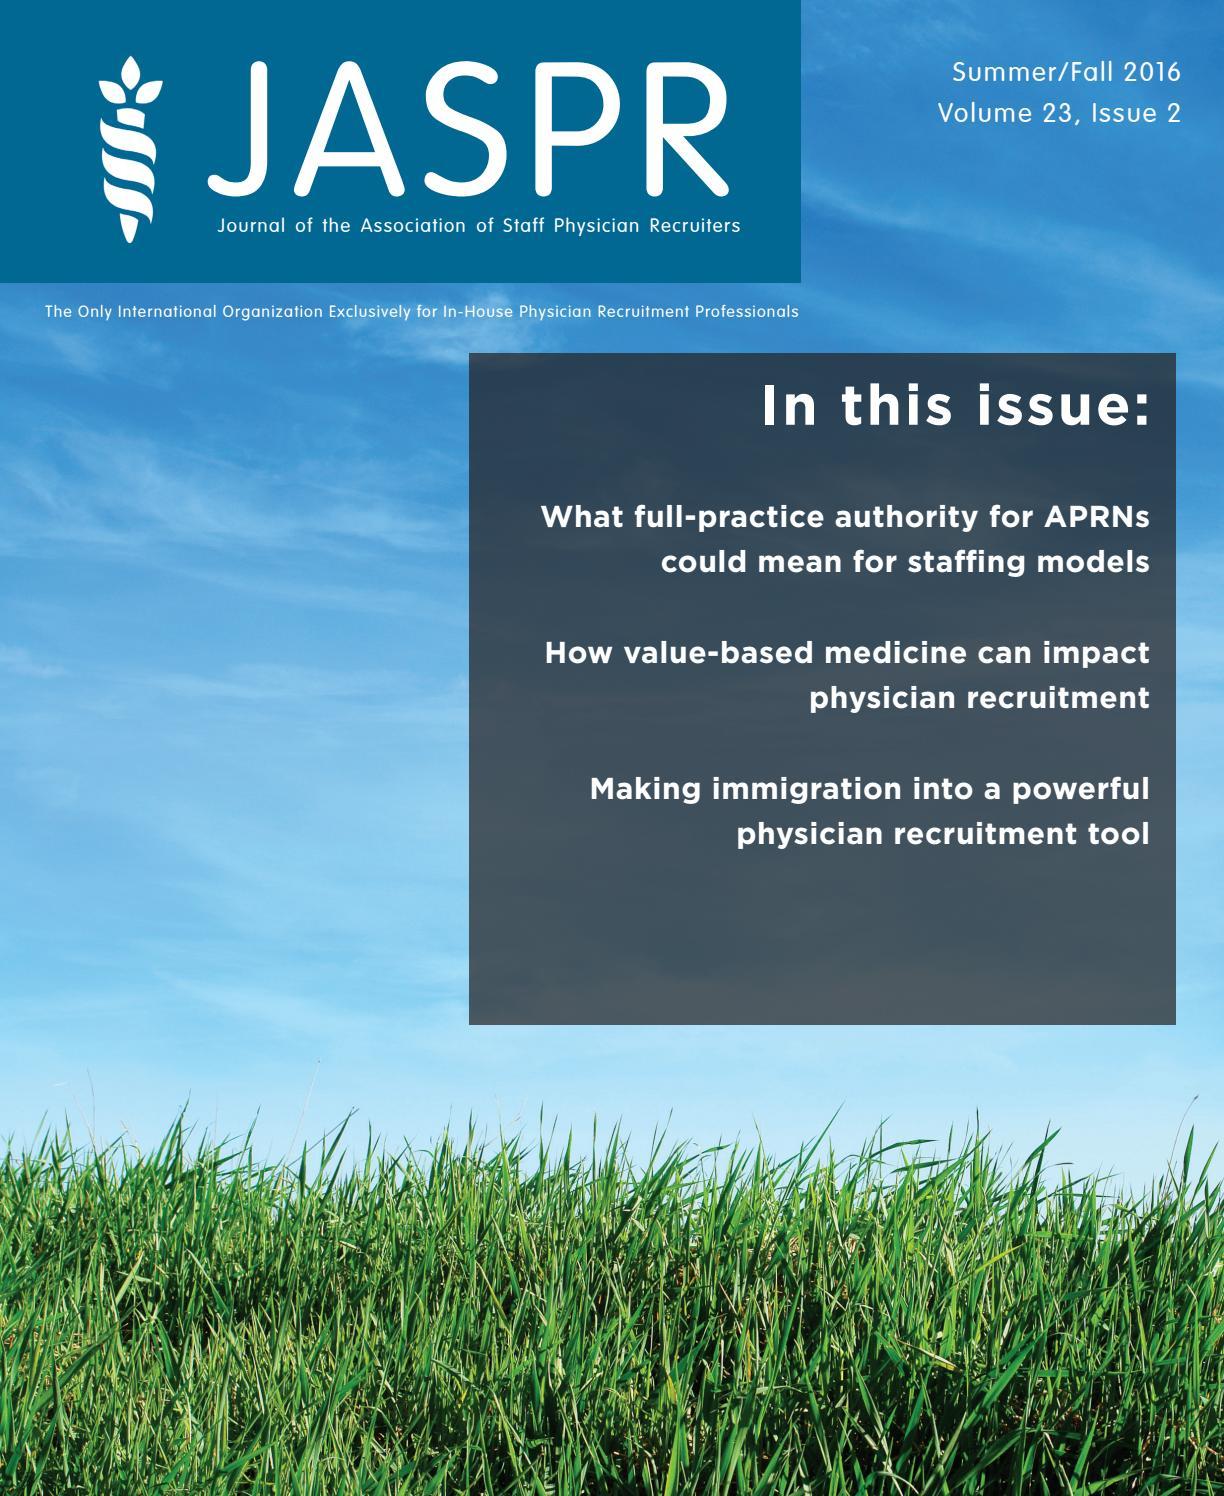 Summer/Fall 2016 Journal of ASPR by Association for